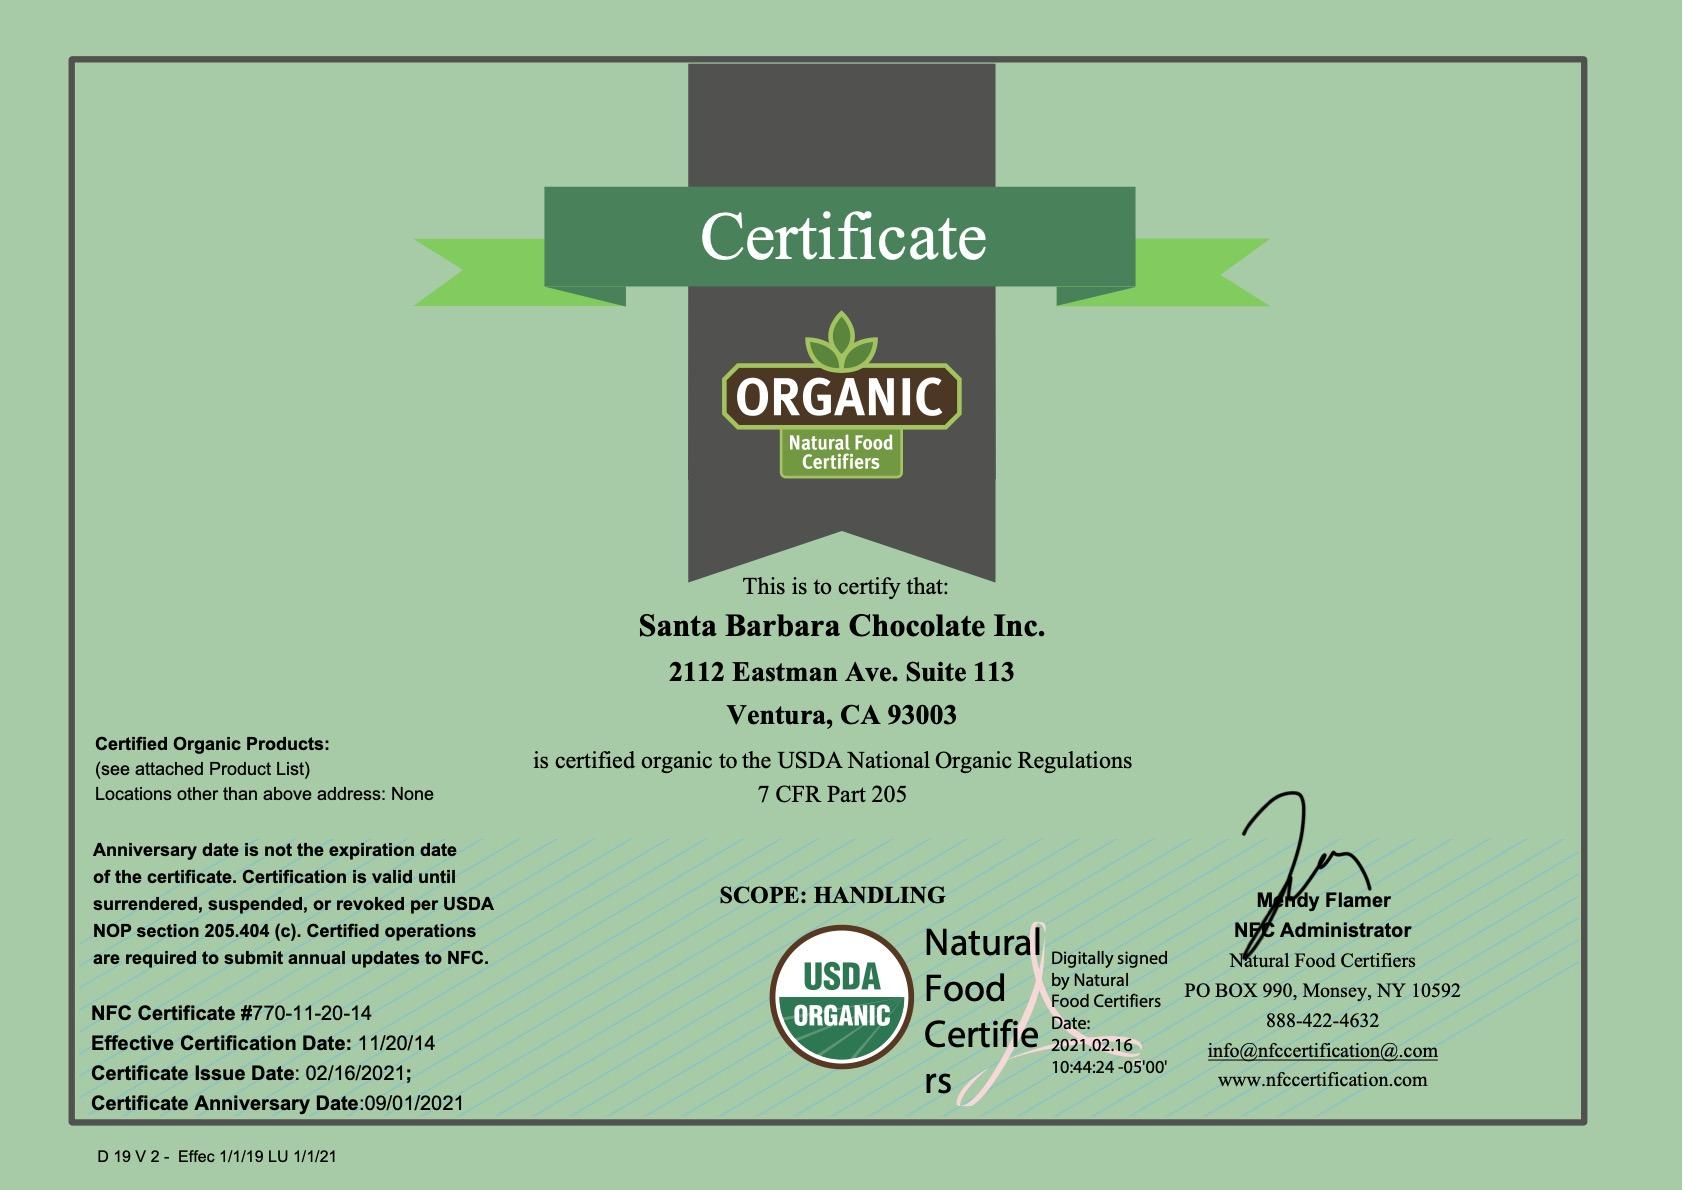 sbc-certificate-2-16-2021signed-1-.jpg